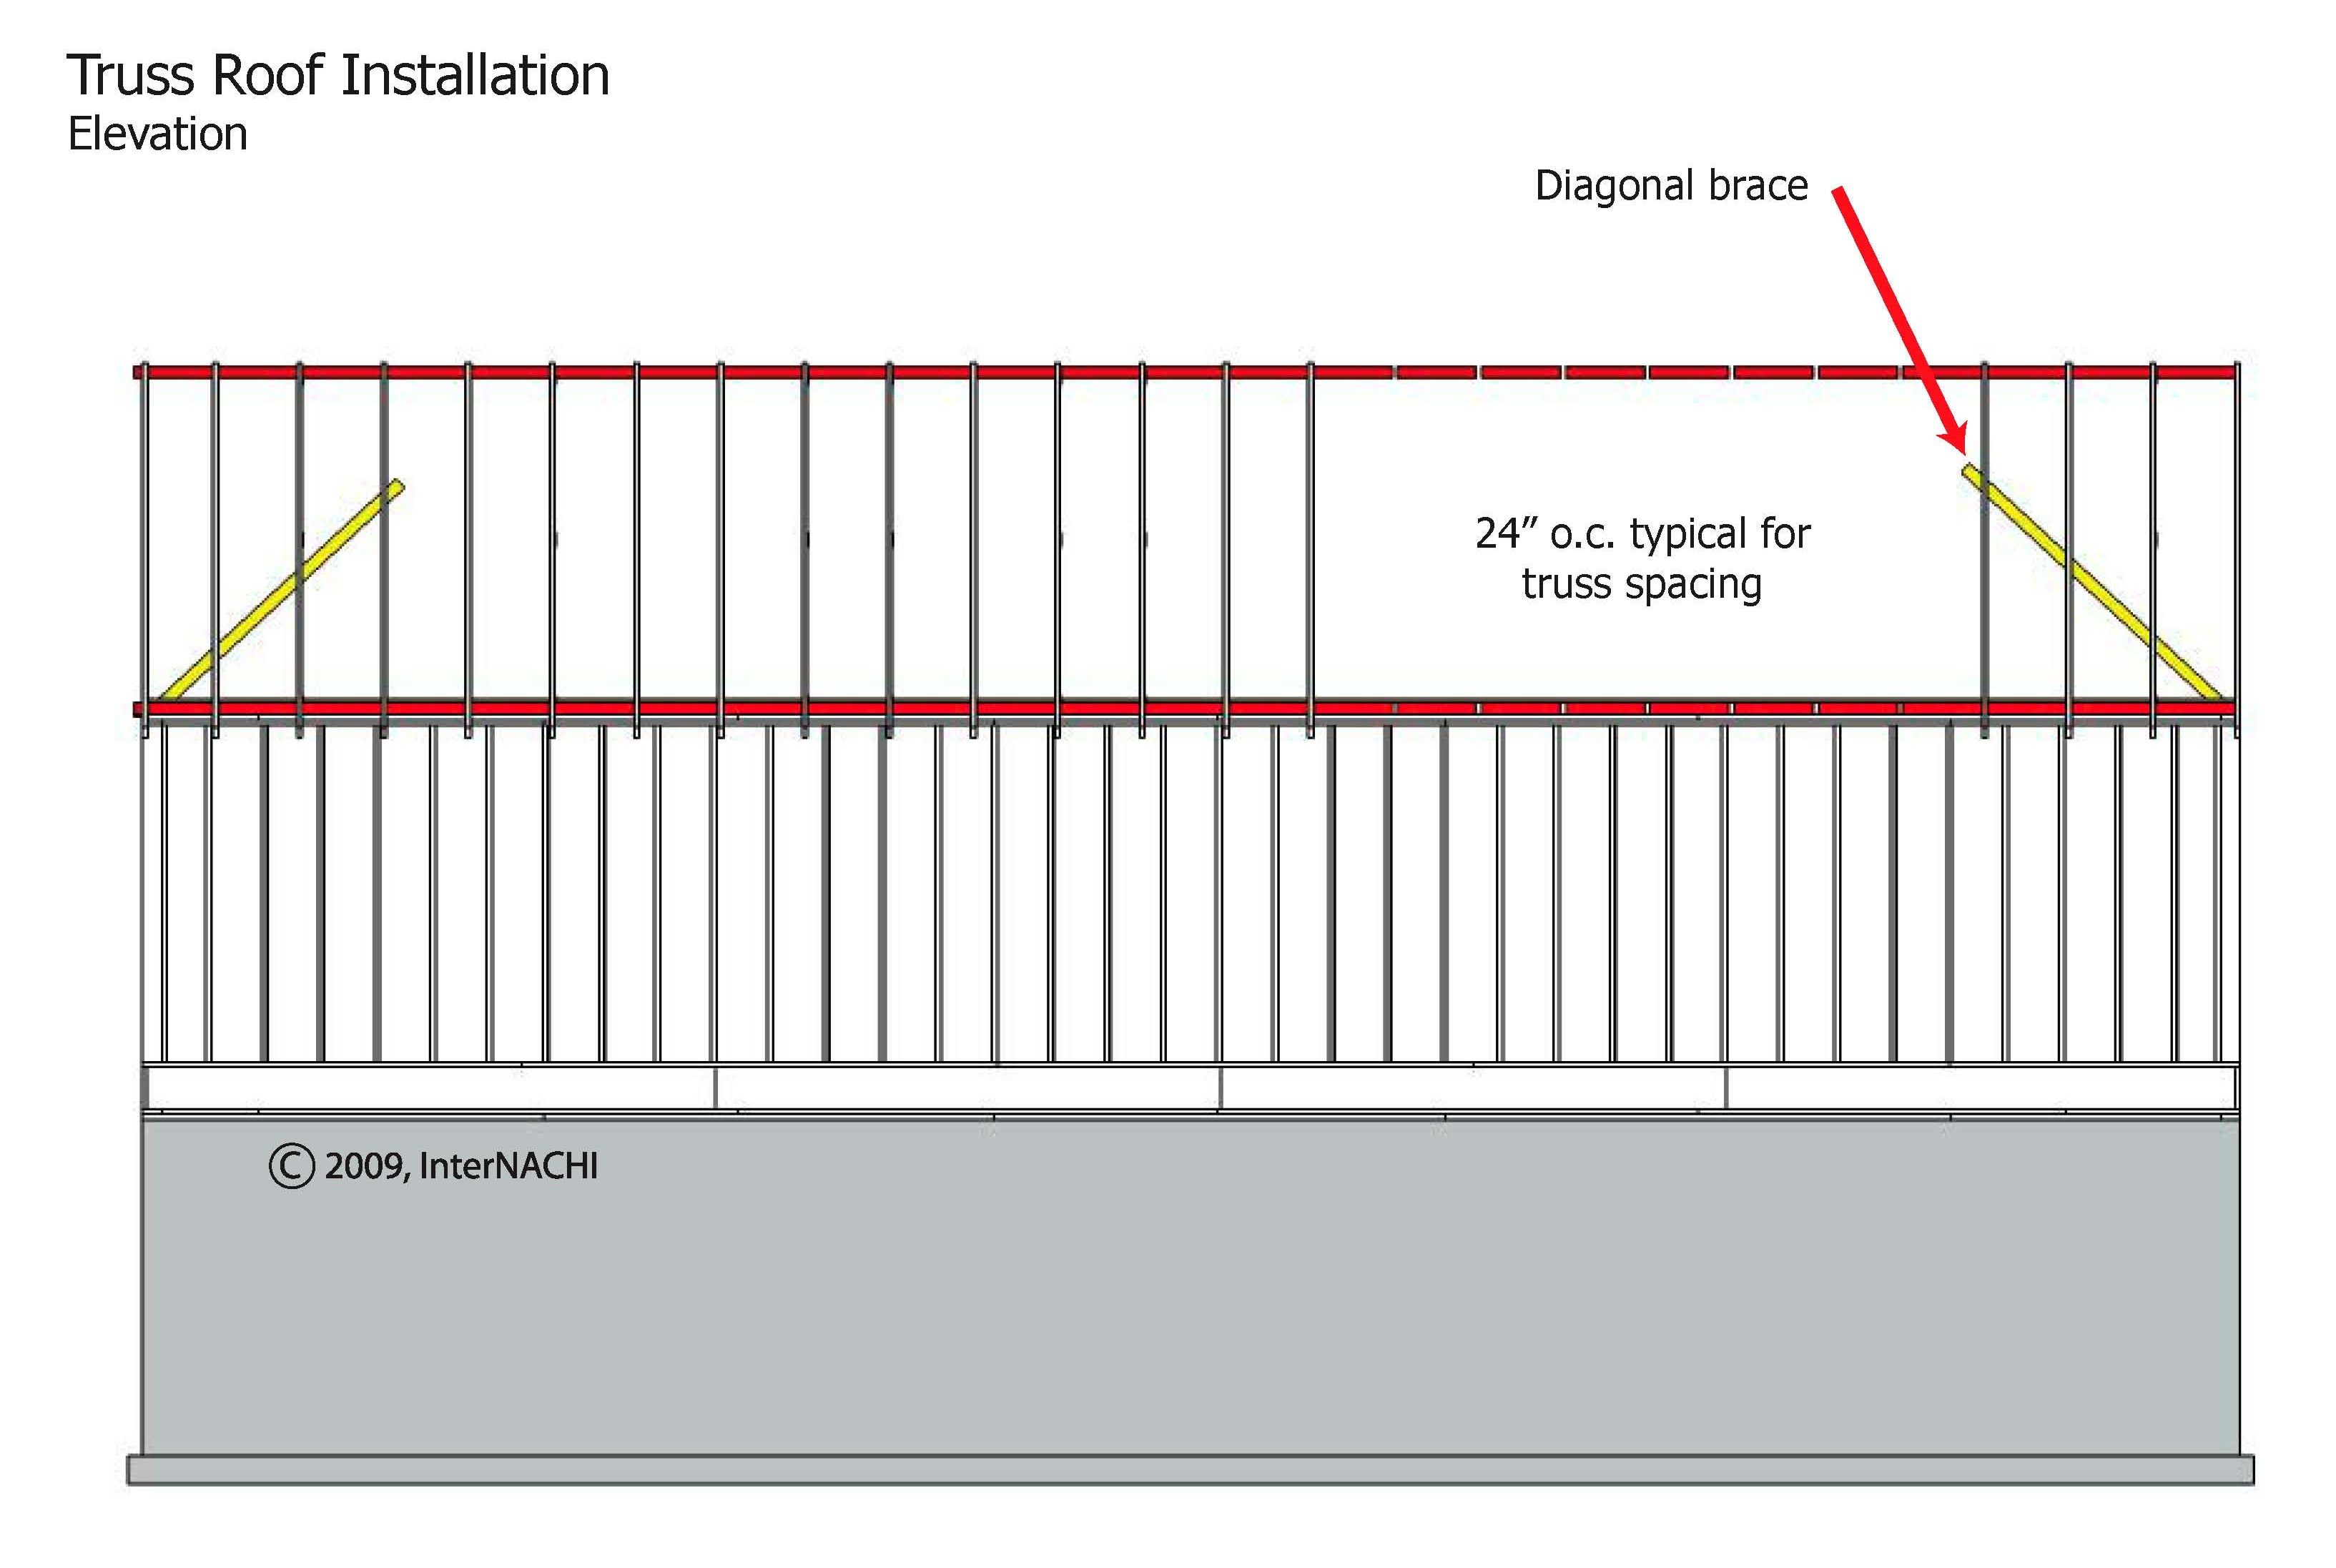 Truss roof installation elevation.